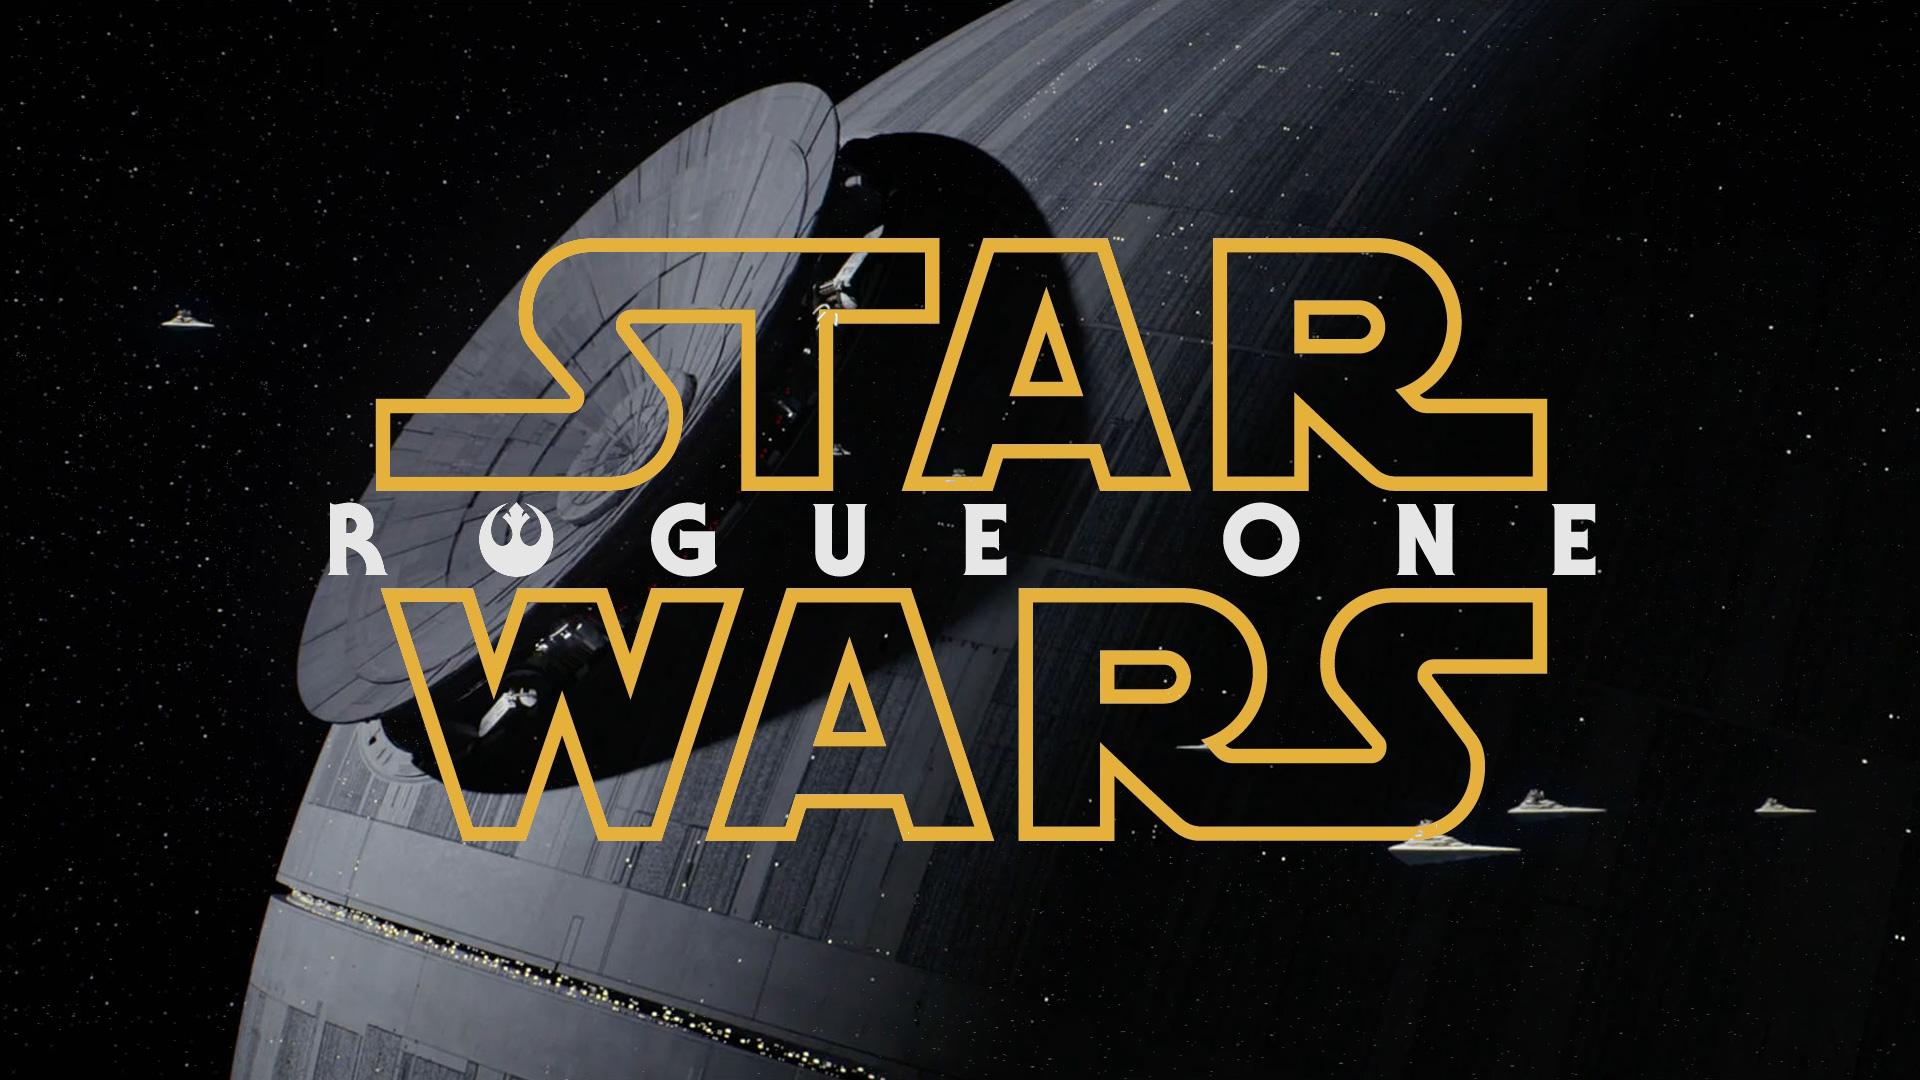 Rogue One Star Wars Story Disney Futuristic Scifi Rosw Wallpaper 1920x1080